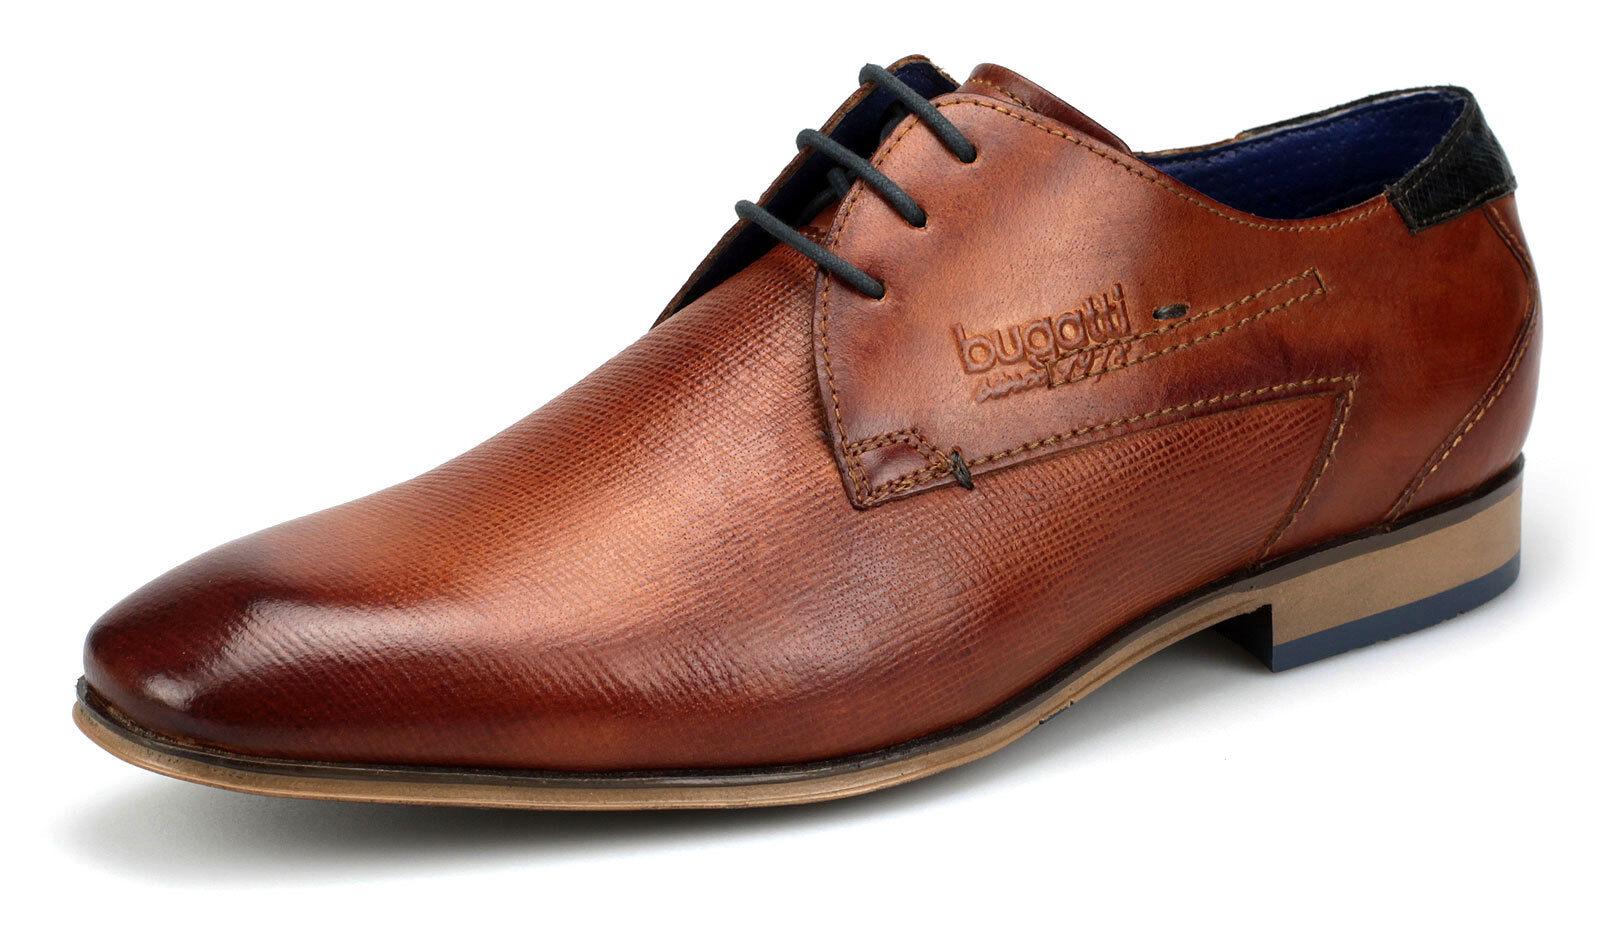 Bugatti Herren Echtleder Halbschuhe Business Schuhe Schnürer 31210108 Cognac